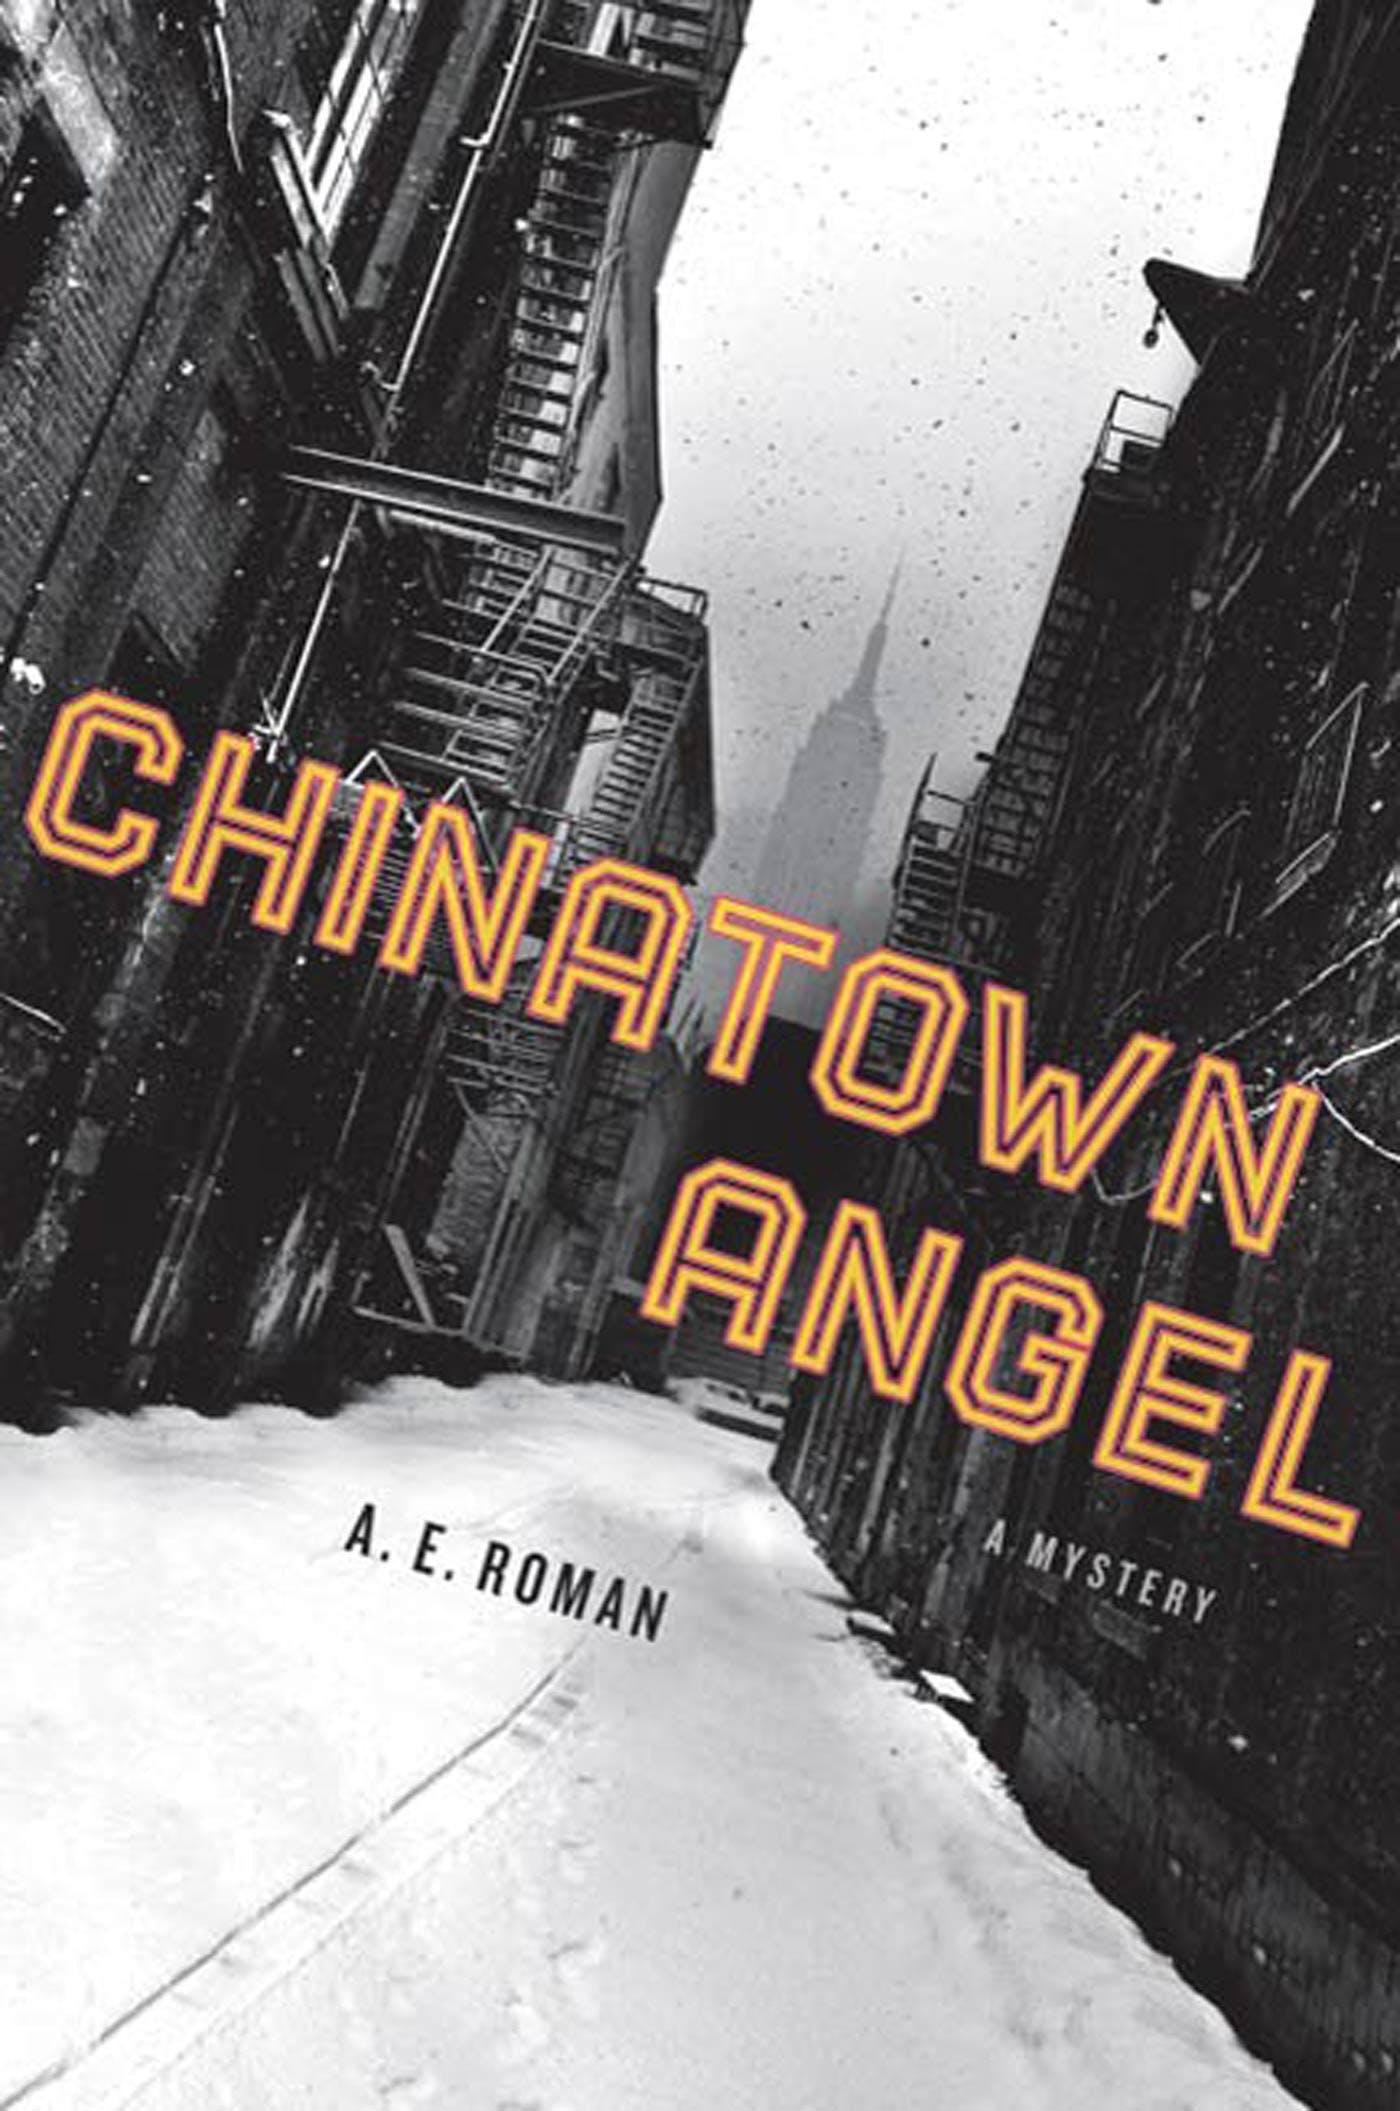 Image of Chinatown Angel